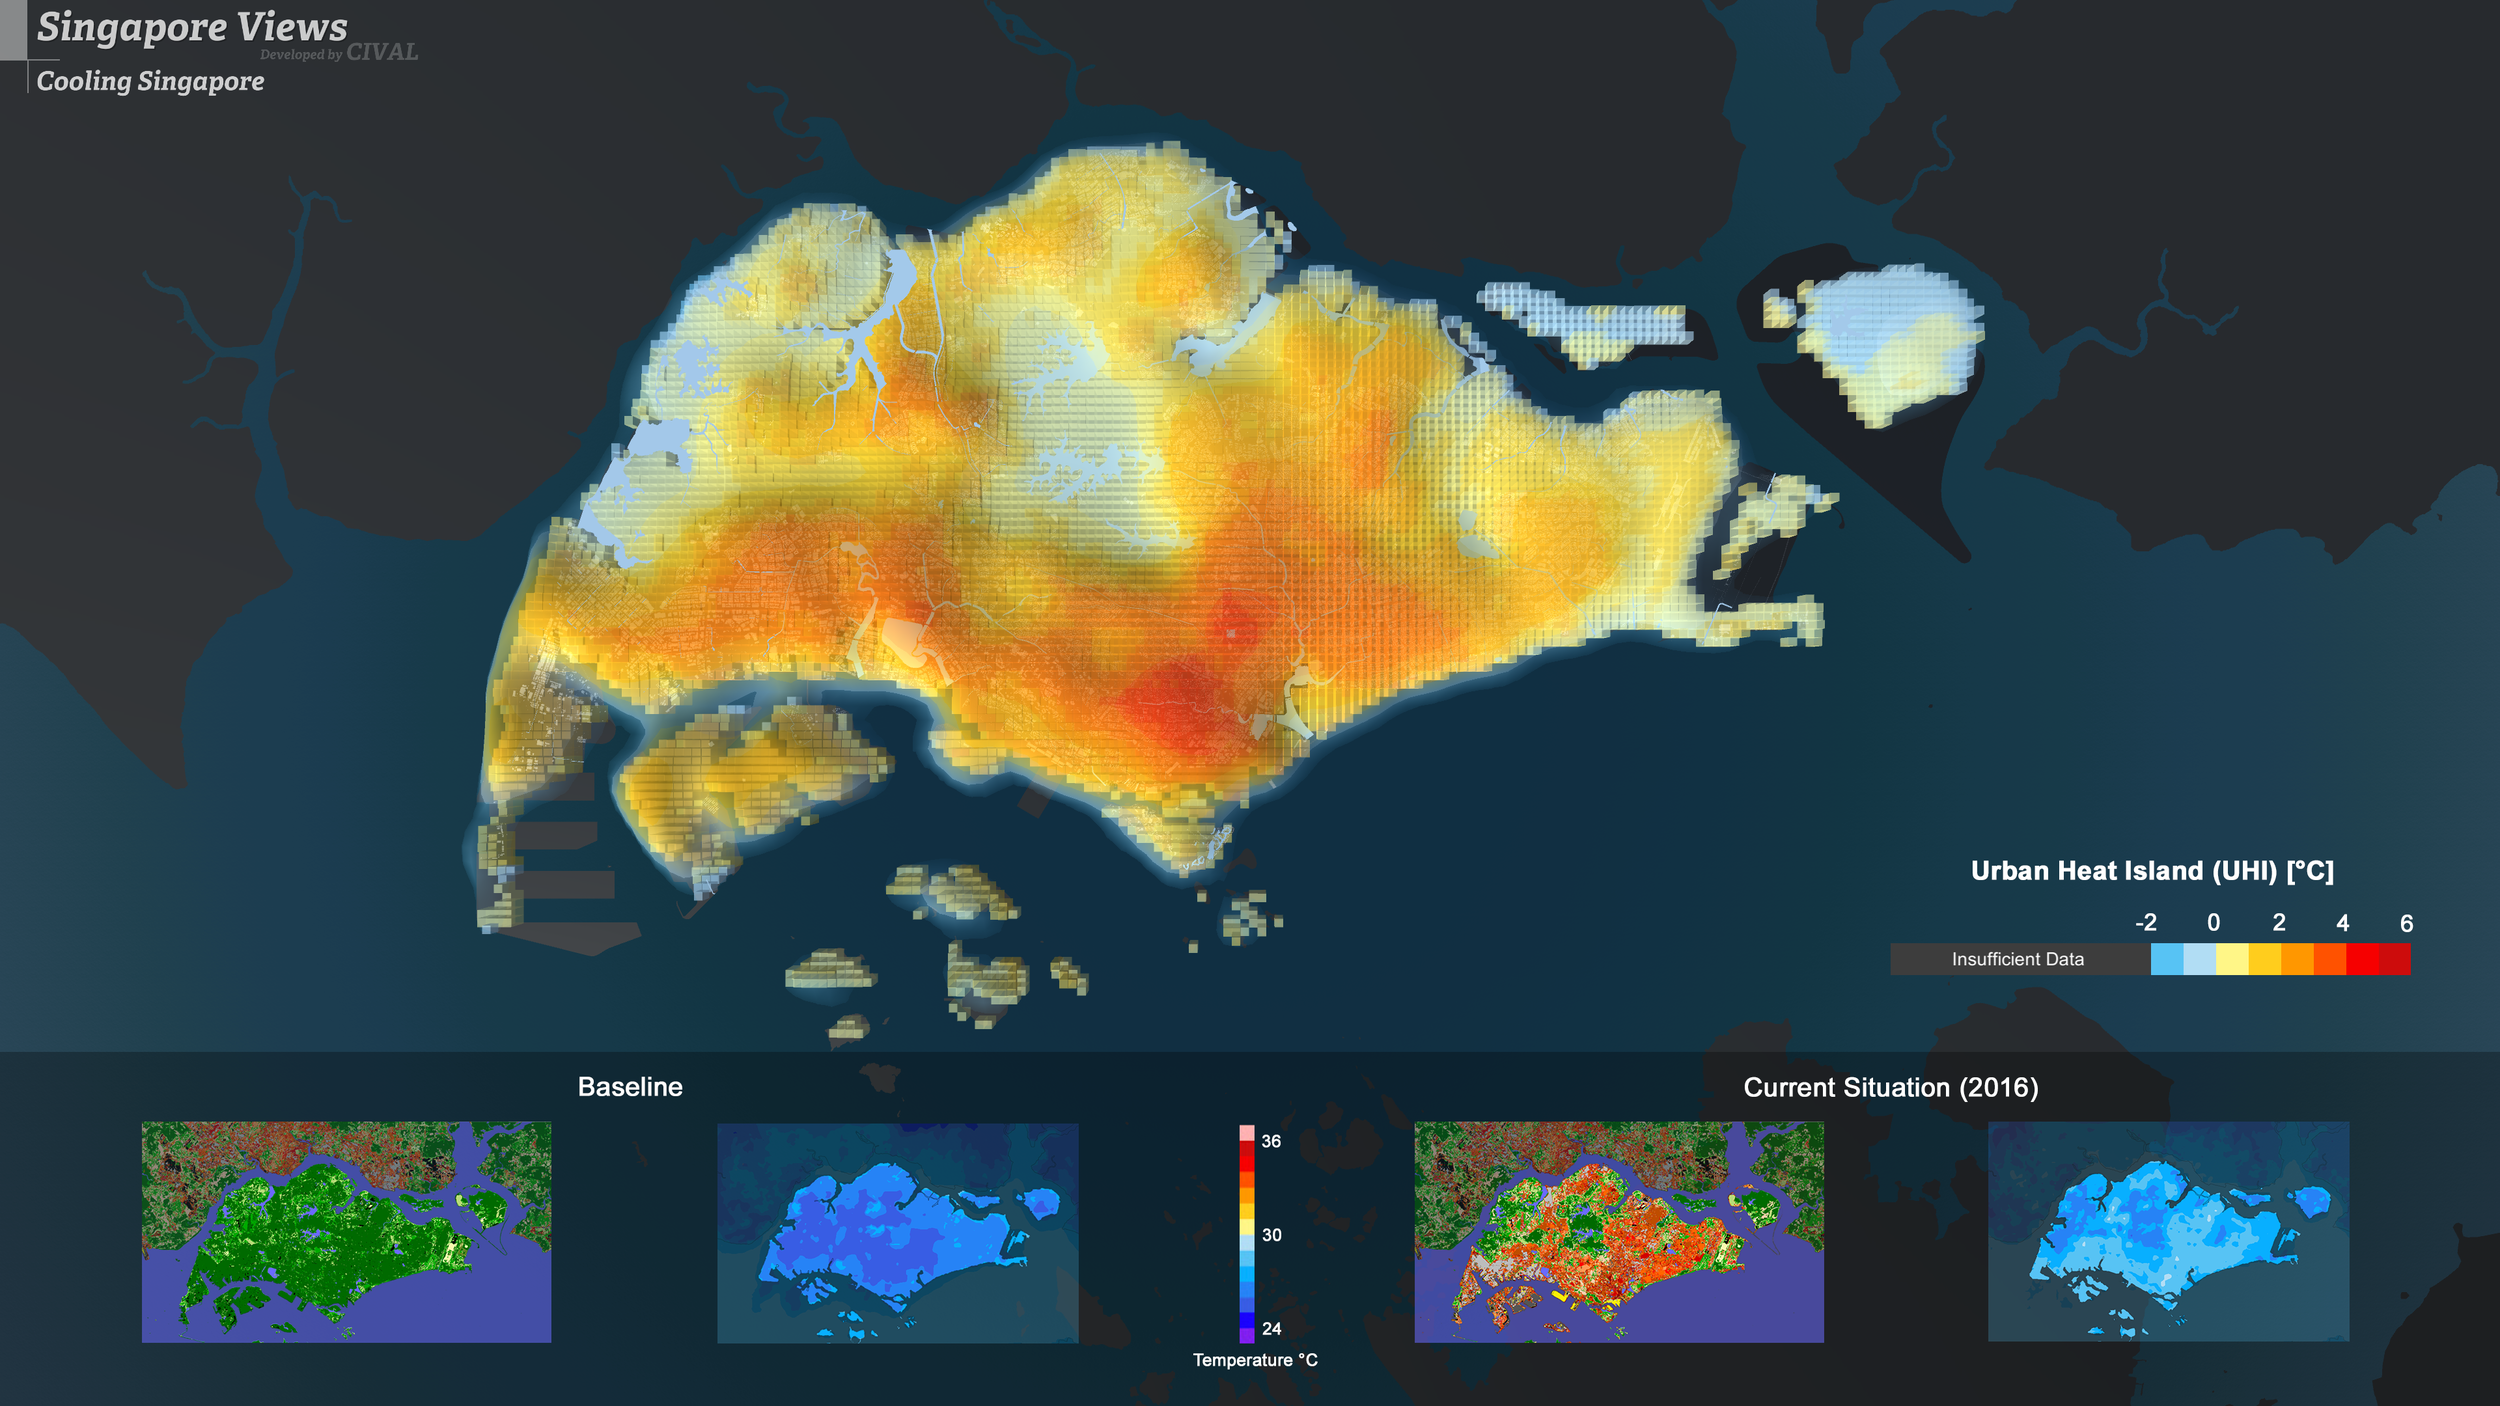 Cooling Singapore & CIVAL, 2018 | Dr. Muhammad Omer MUGHAL & Sailin ZHONG